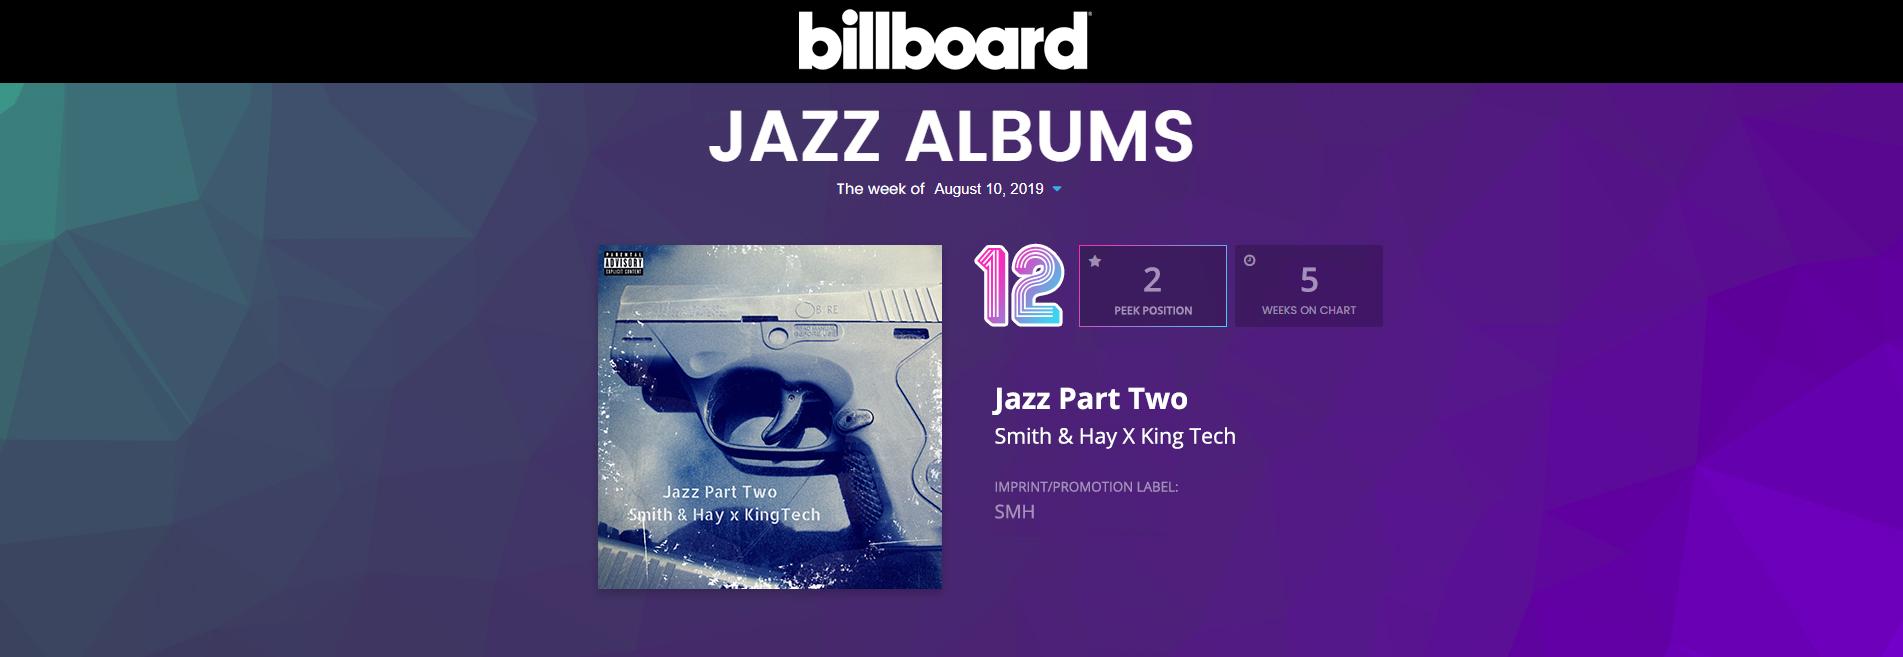 Jazz Part Two by Smith & Hay, DJ King Tech, Iliana Eve, Atlas Jenkins, Goldy Locks Band.jpg